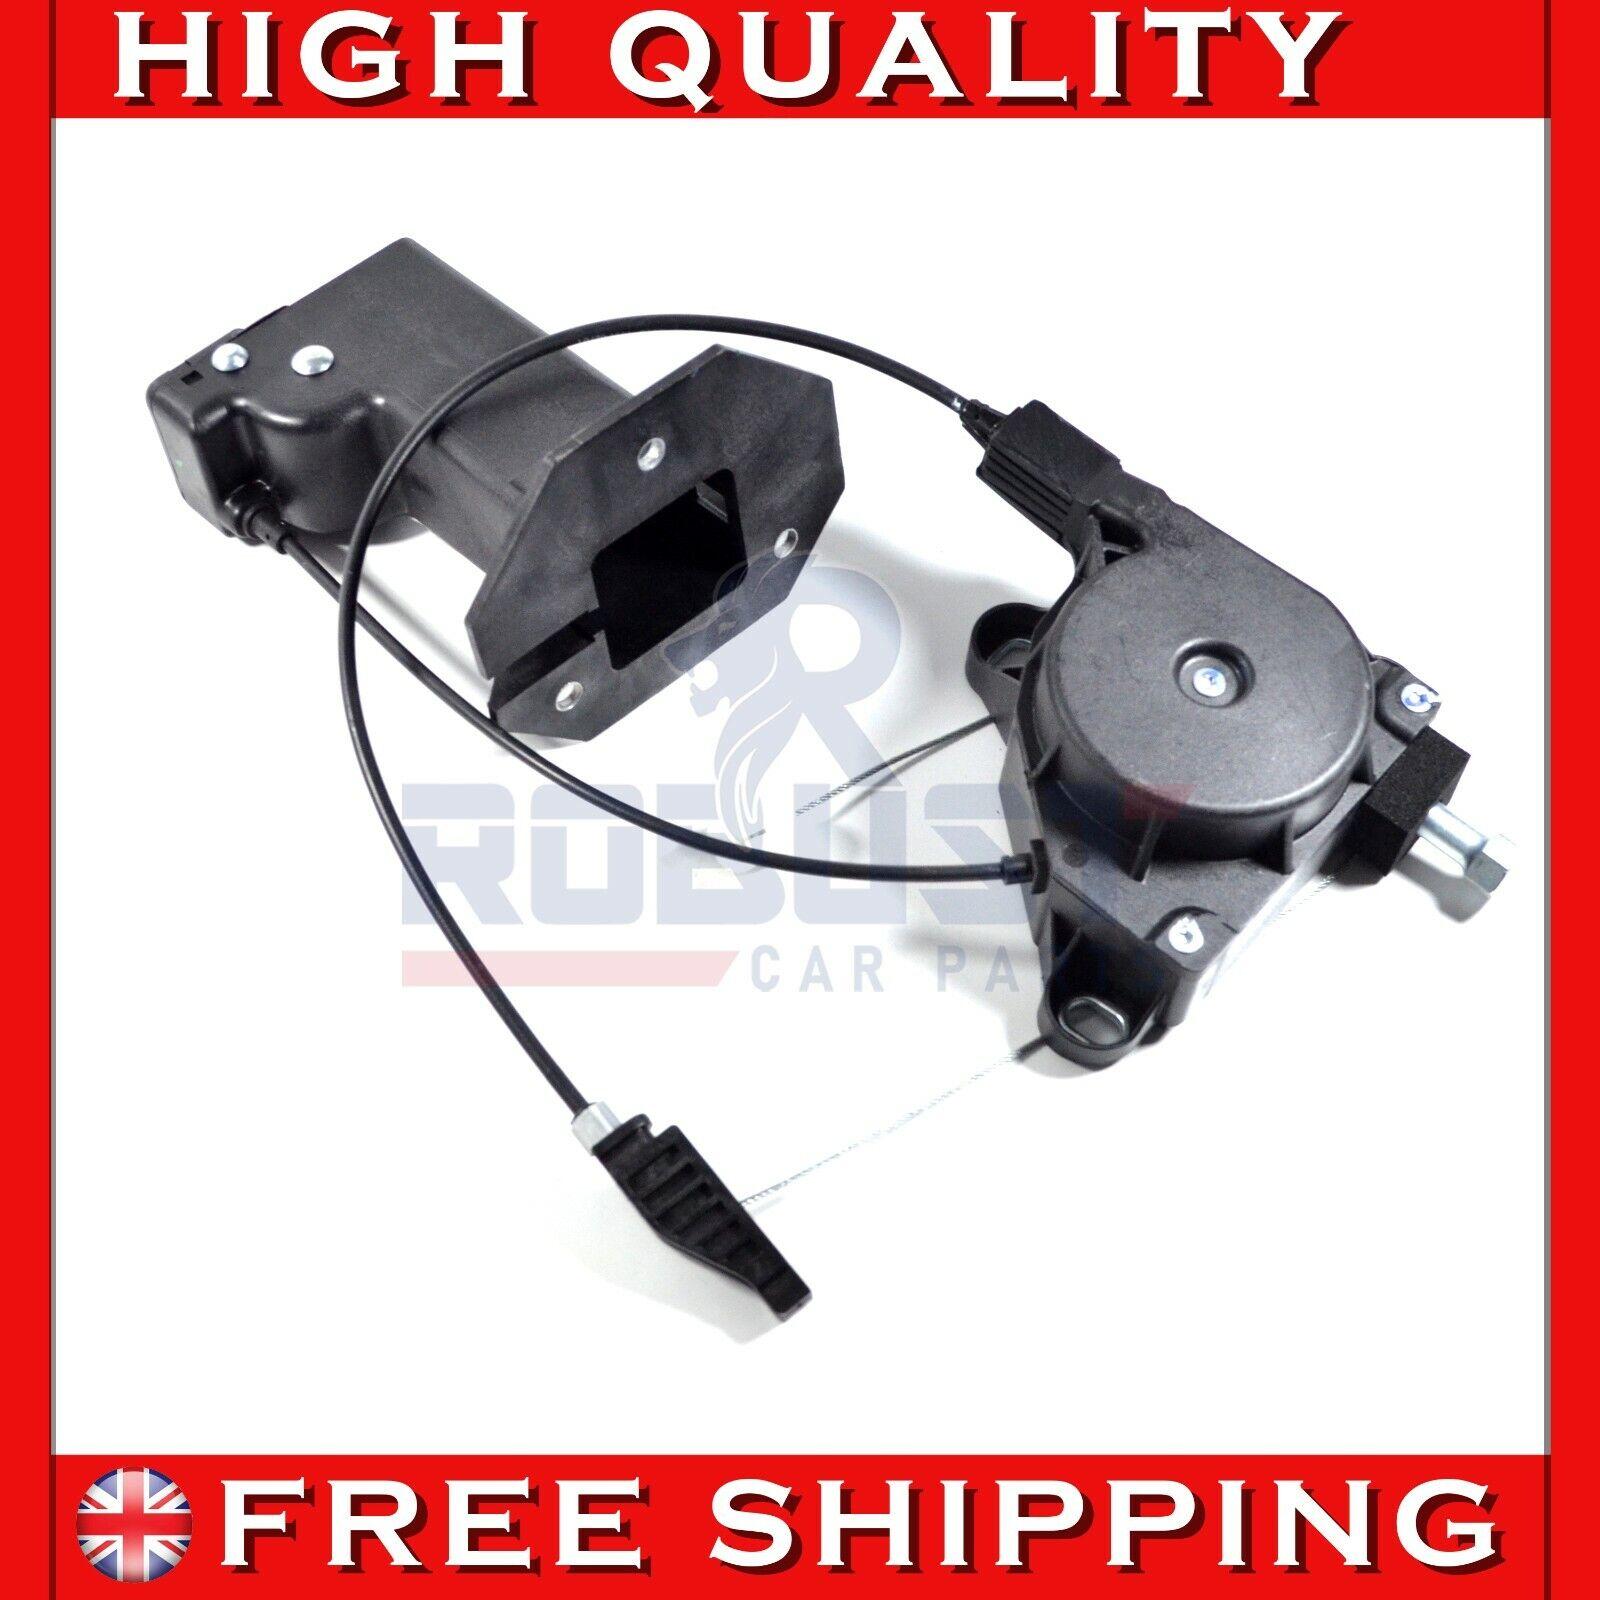 Car Parts - PEUGEOT BIPPER CITROEN NEMO SPARE WHEEL CARRIER RELEASE MECHANISM 7603W5